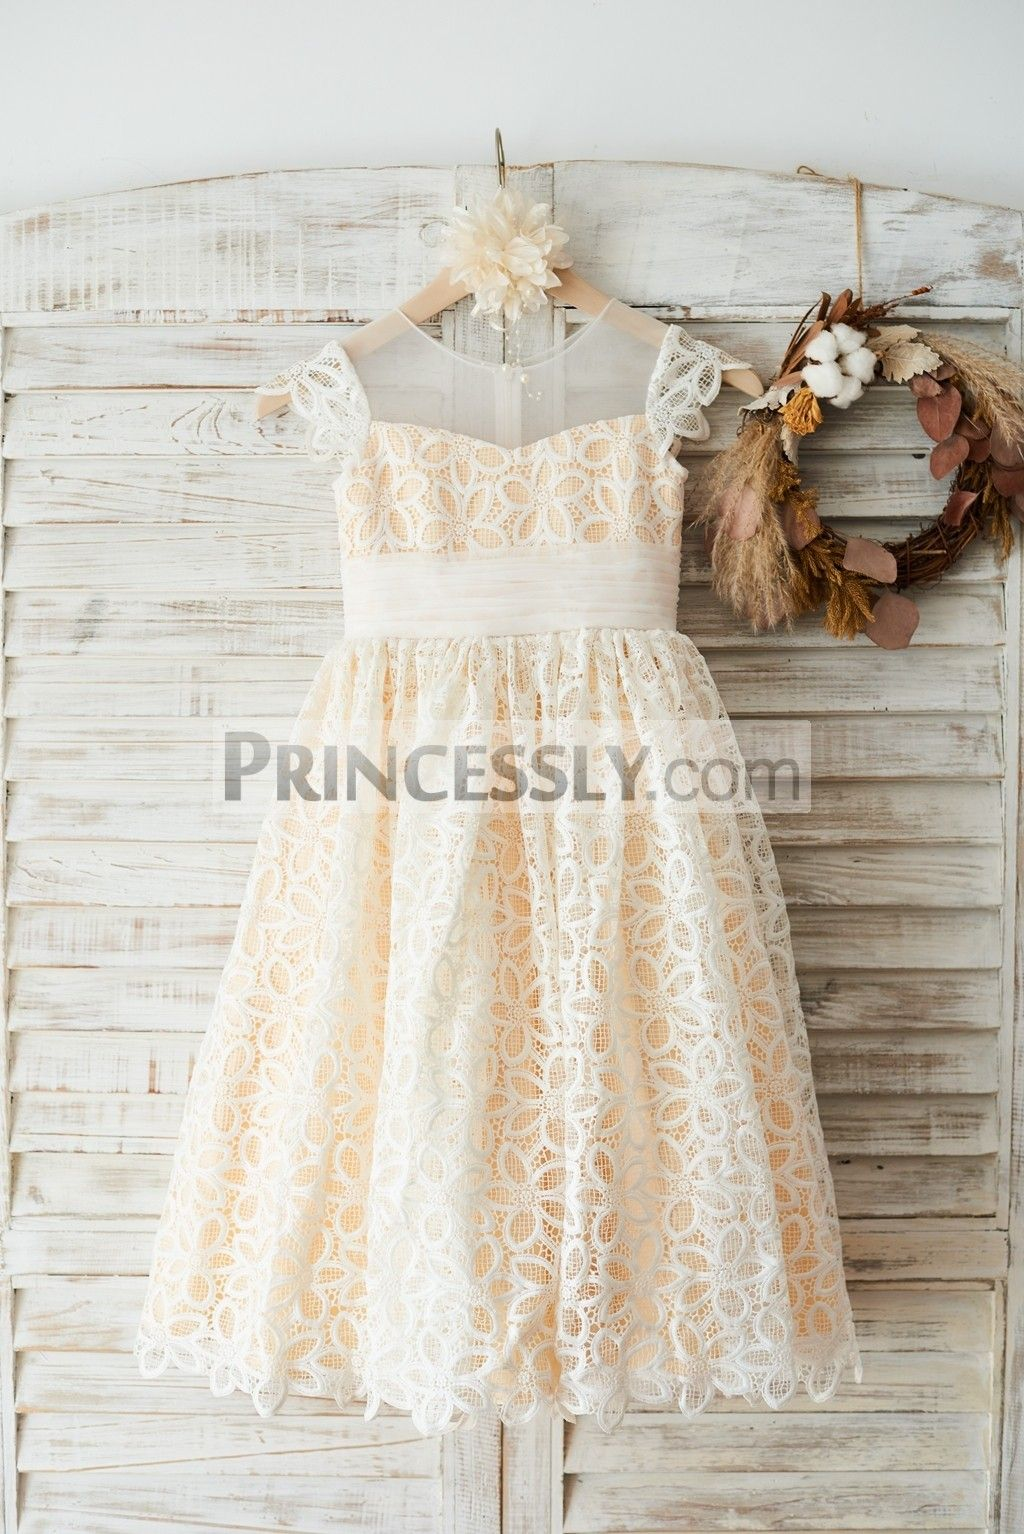 Girls wedding dress  Cap Sleeves Ivory Lace Illusion Neck Wedding Flower Girl Dress